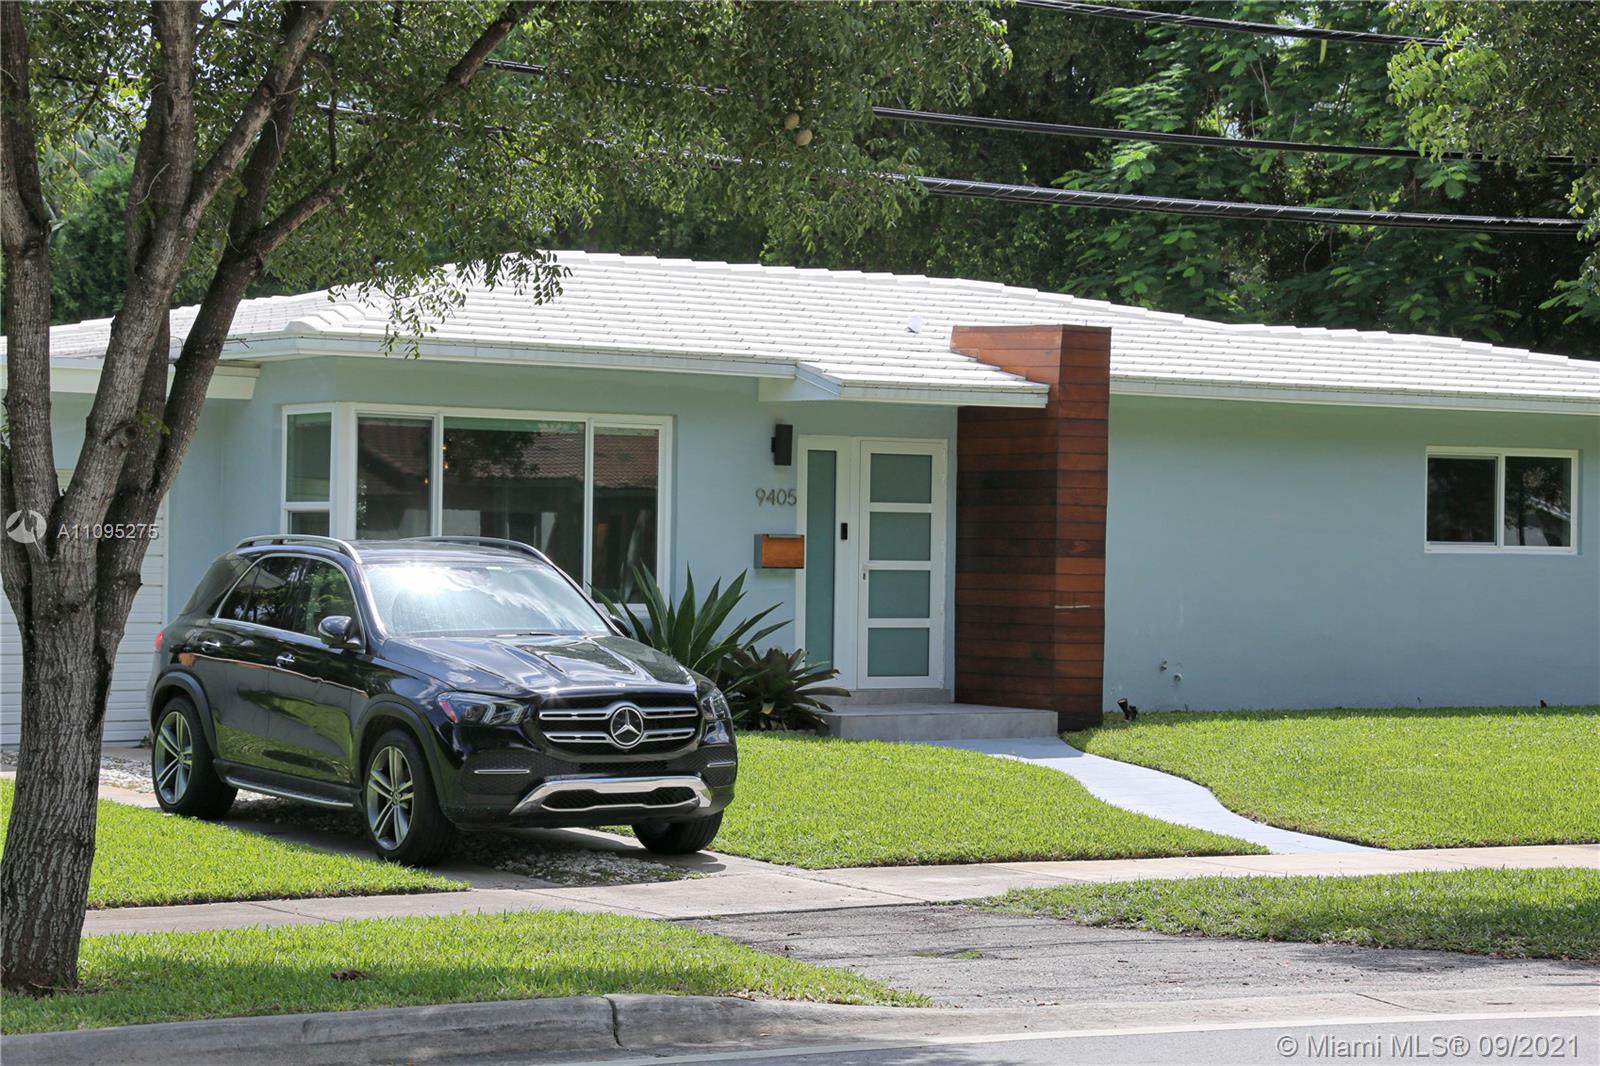 Miami Shores - 9405 NW 2nd Ave, Miami Shores, FL 33150